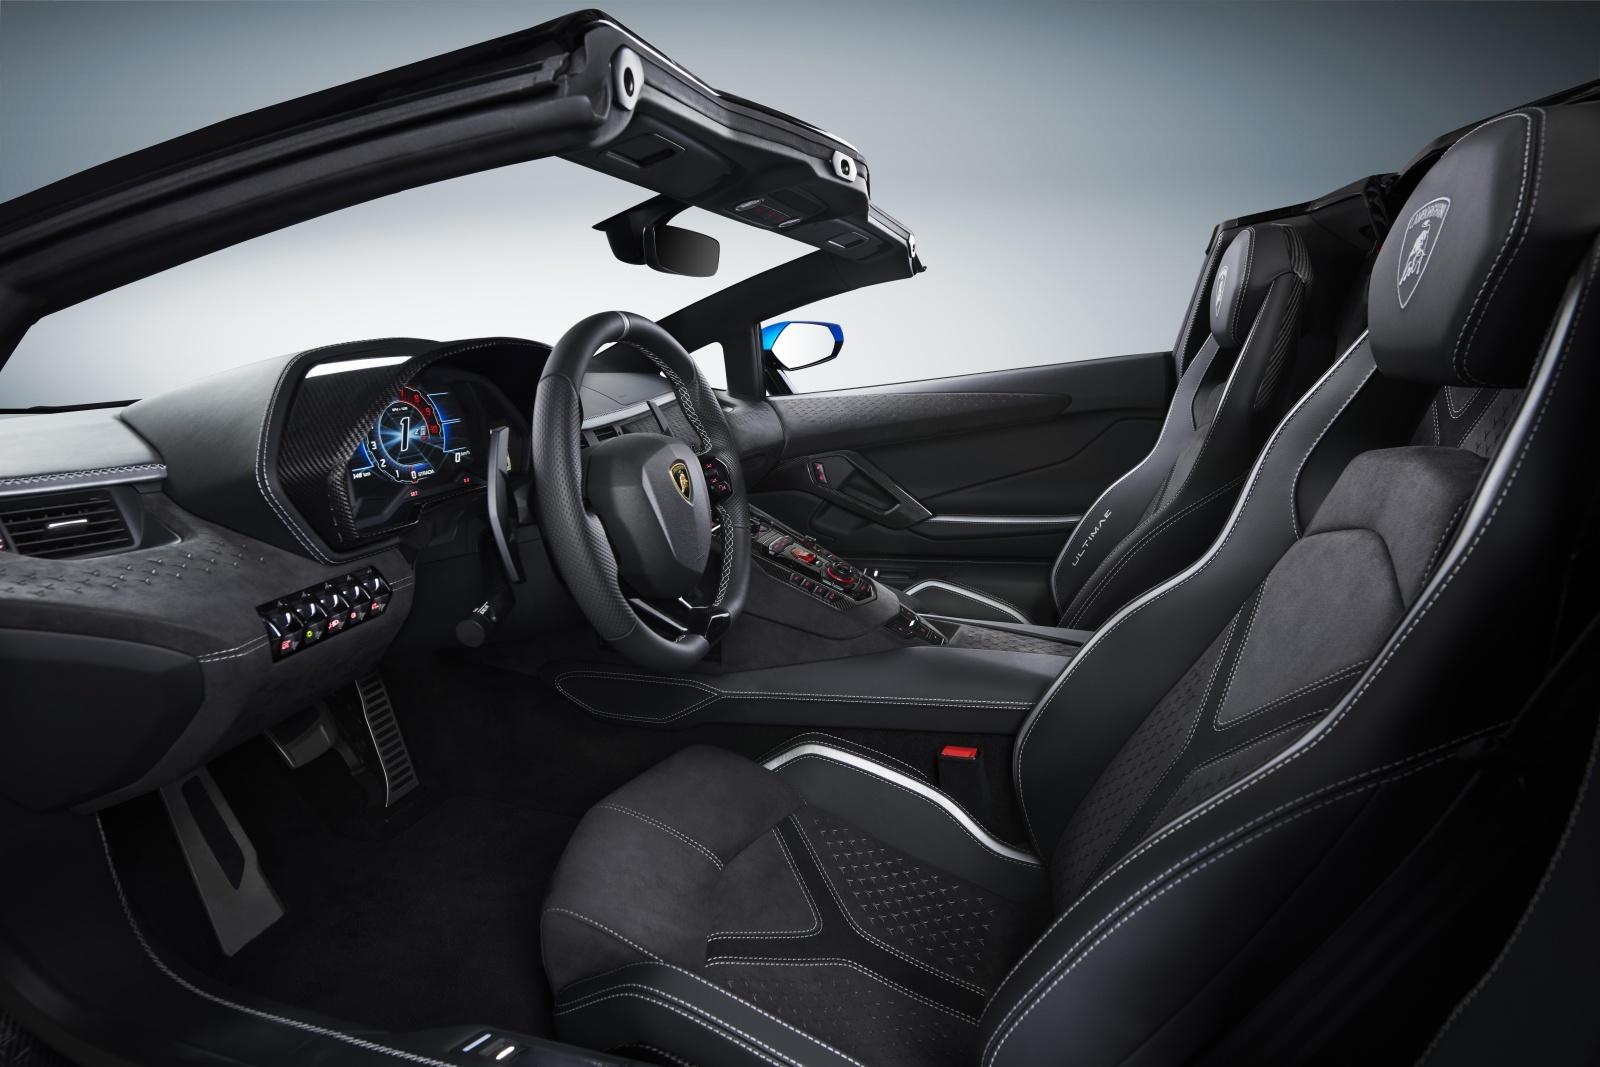 Lamborghini Aventador LP 780-4 Ultimae roadster - wnętrze, deska rozdzielcza